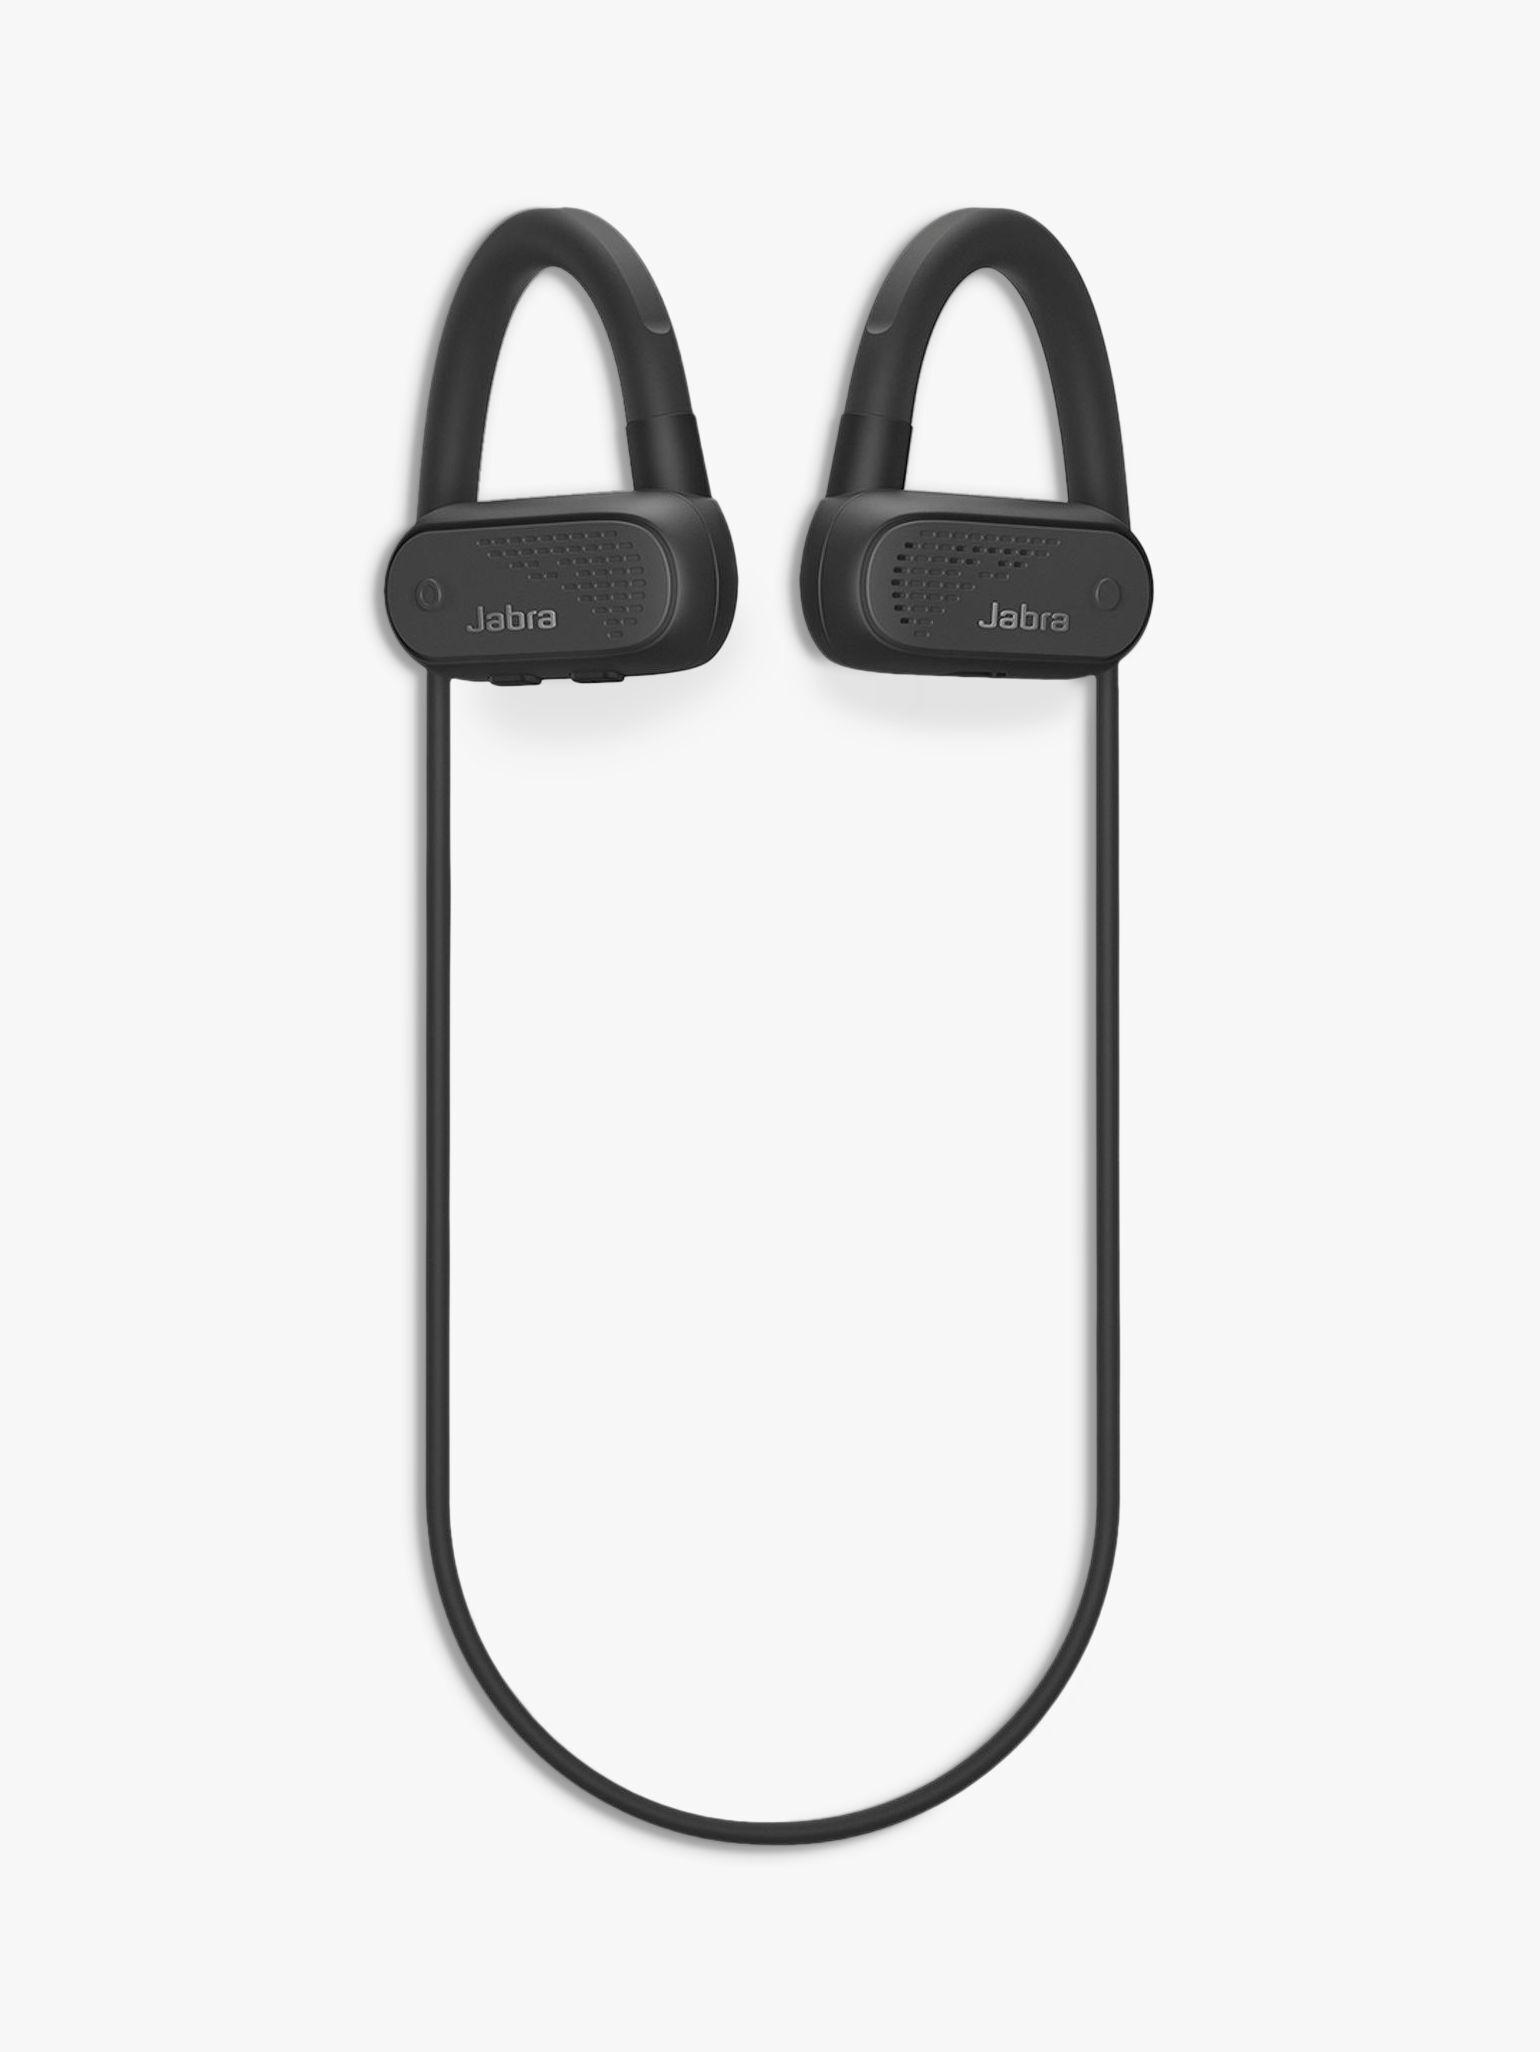 Jabra Elite Active 45e Wireless Waterproof Bluetooth In-Ear Headphones with Mic/Remote  - Black